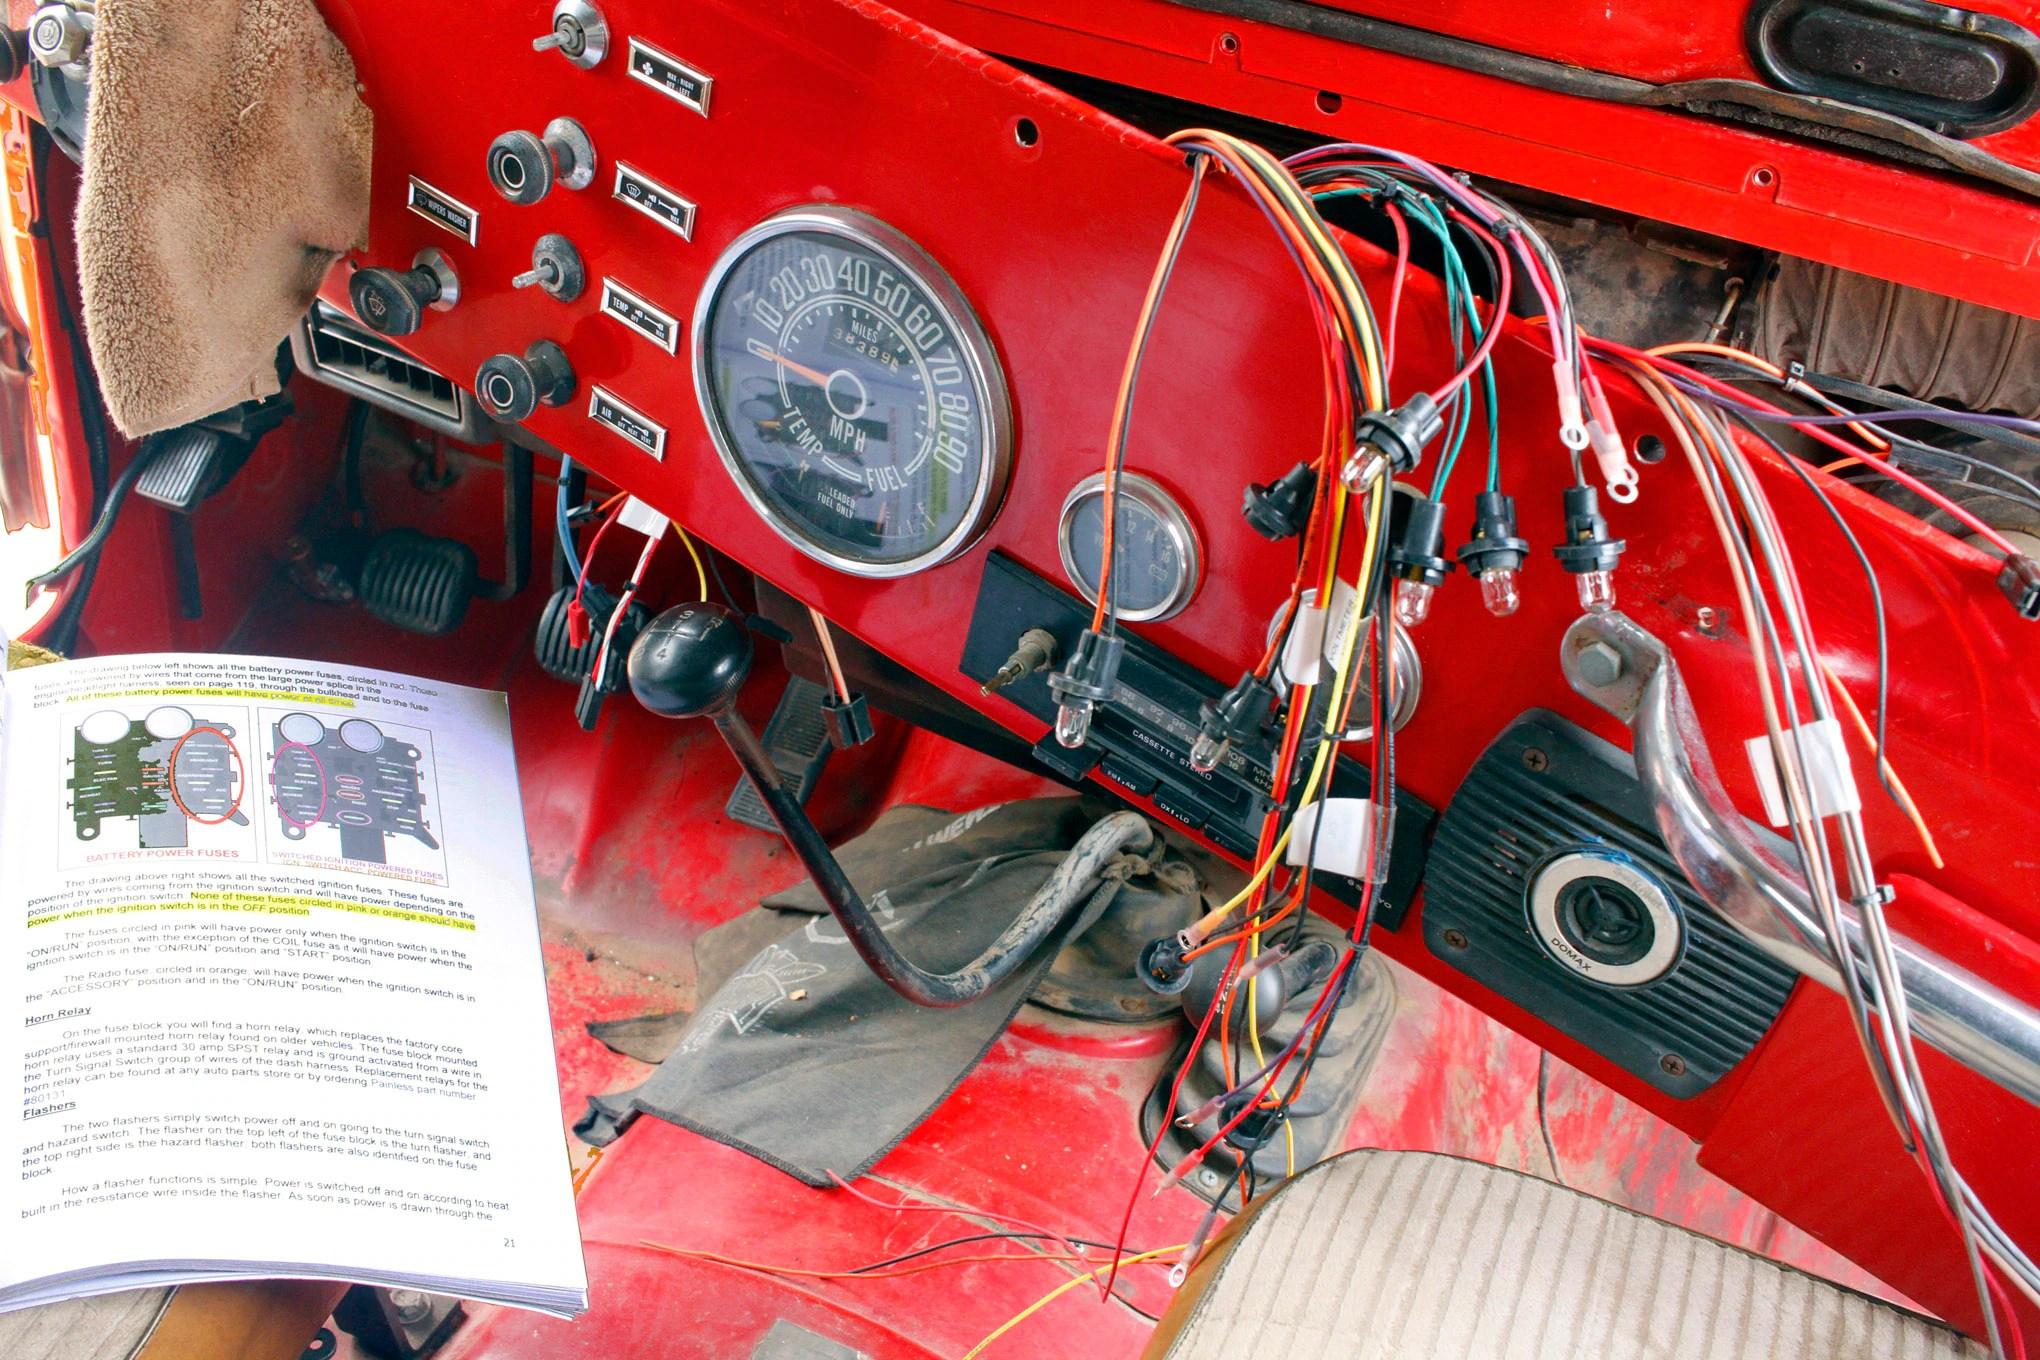 cj wiring harness image restore wiring diagram cj wiring harness image restore [ 2040 x 1360 Pixel ]